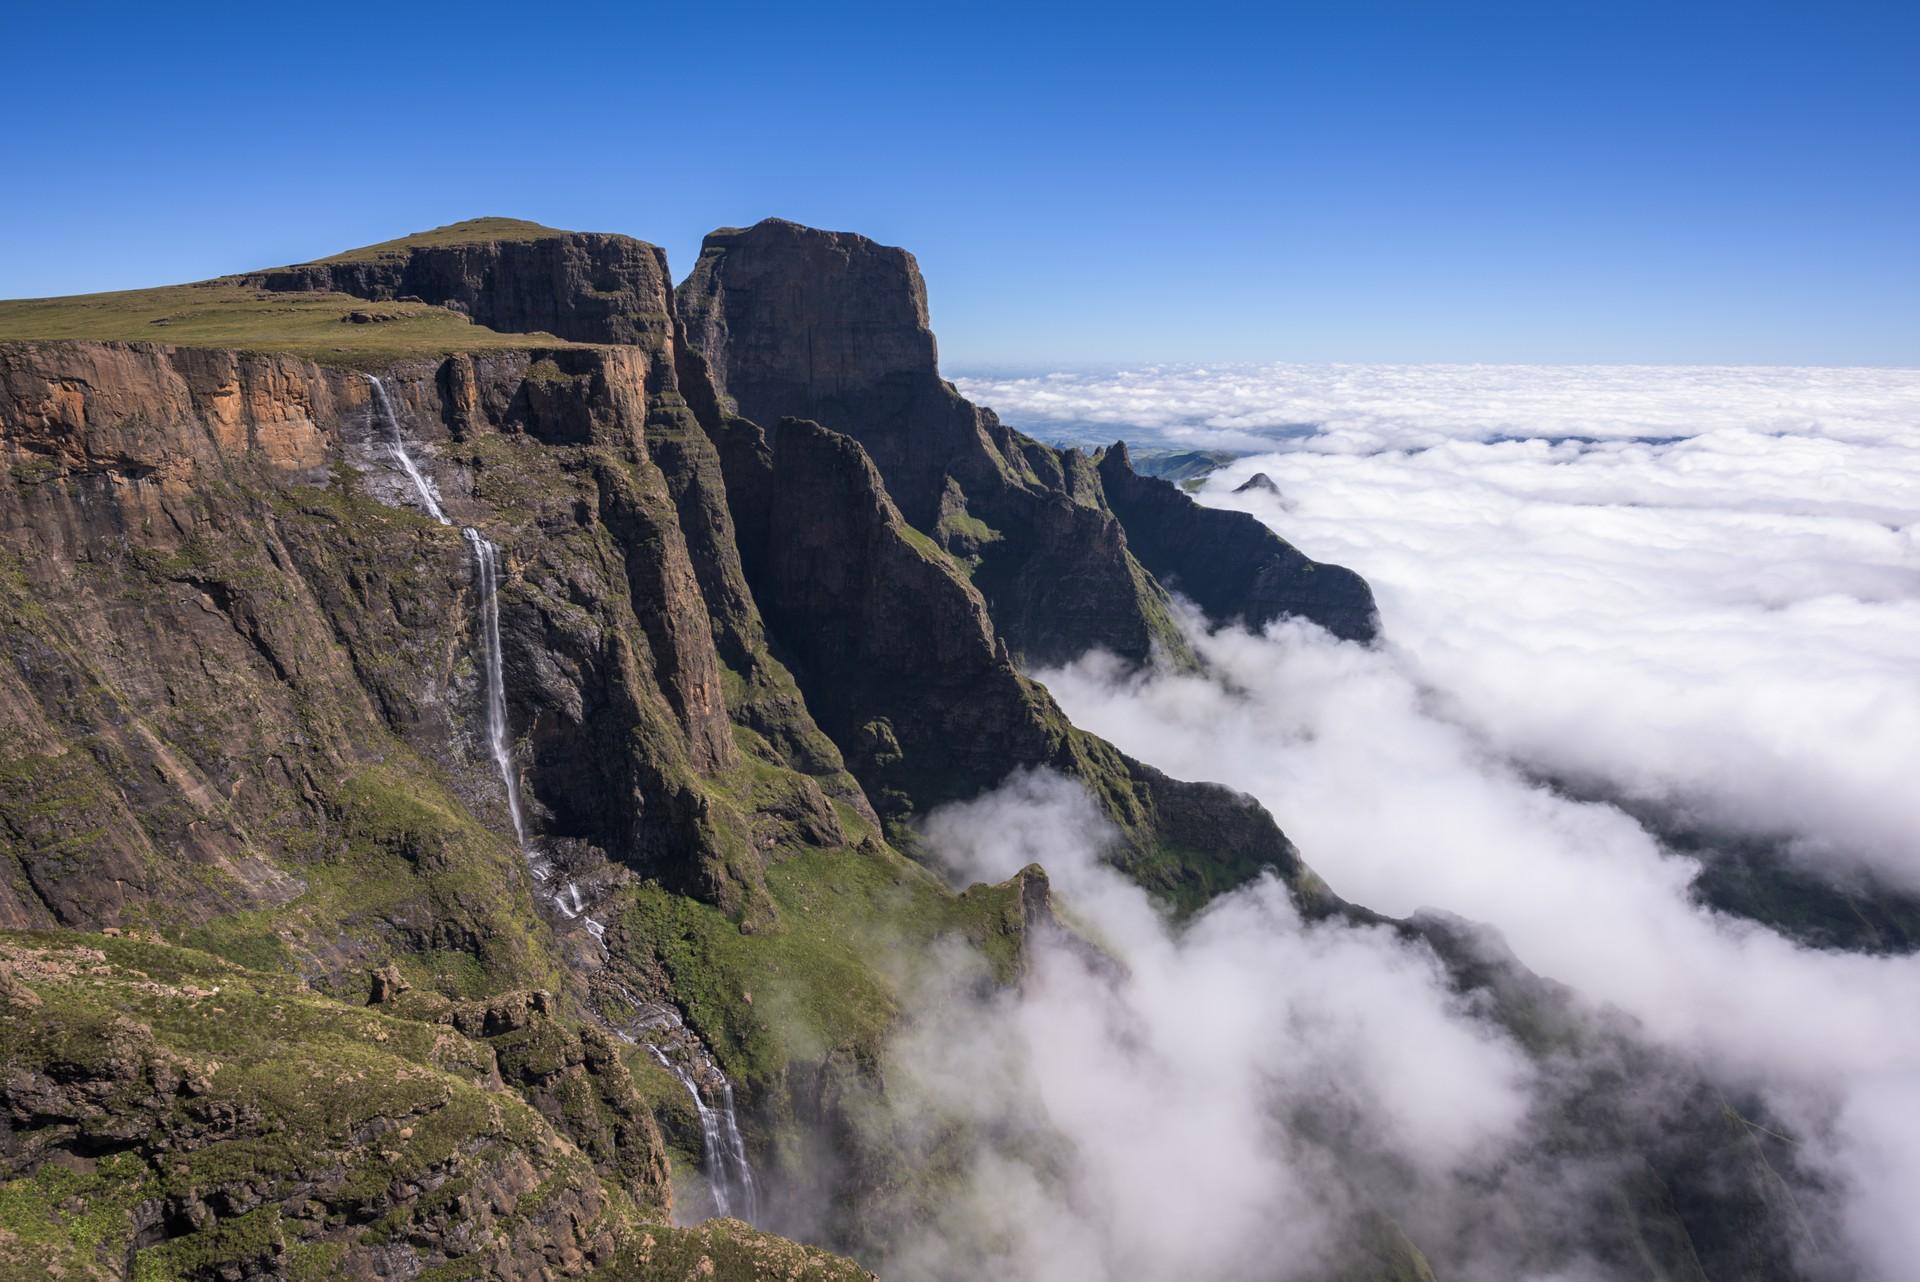 Tugela Falls in Drakensberg, South Africa